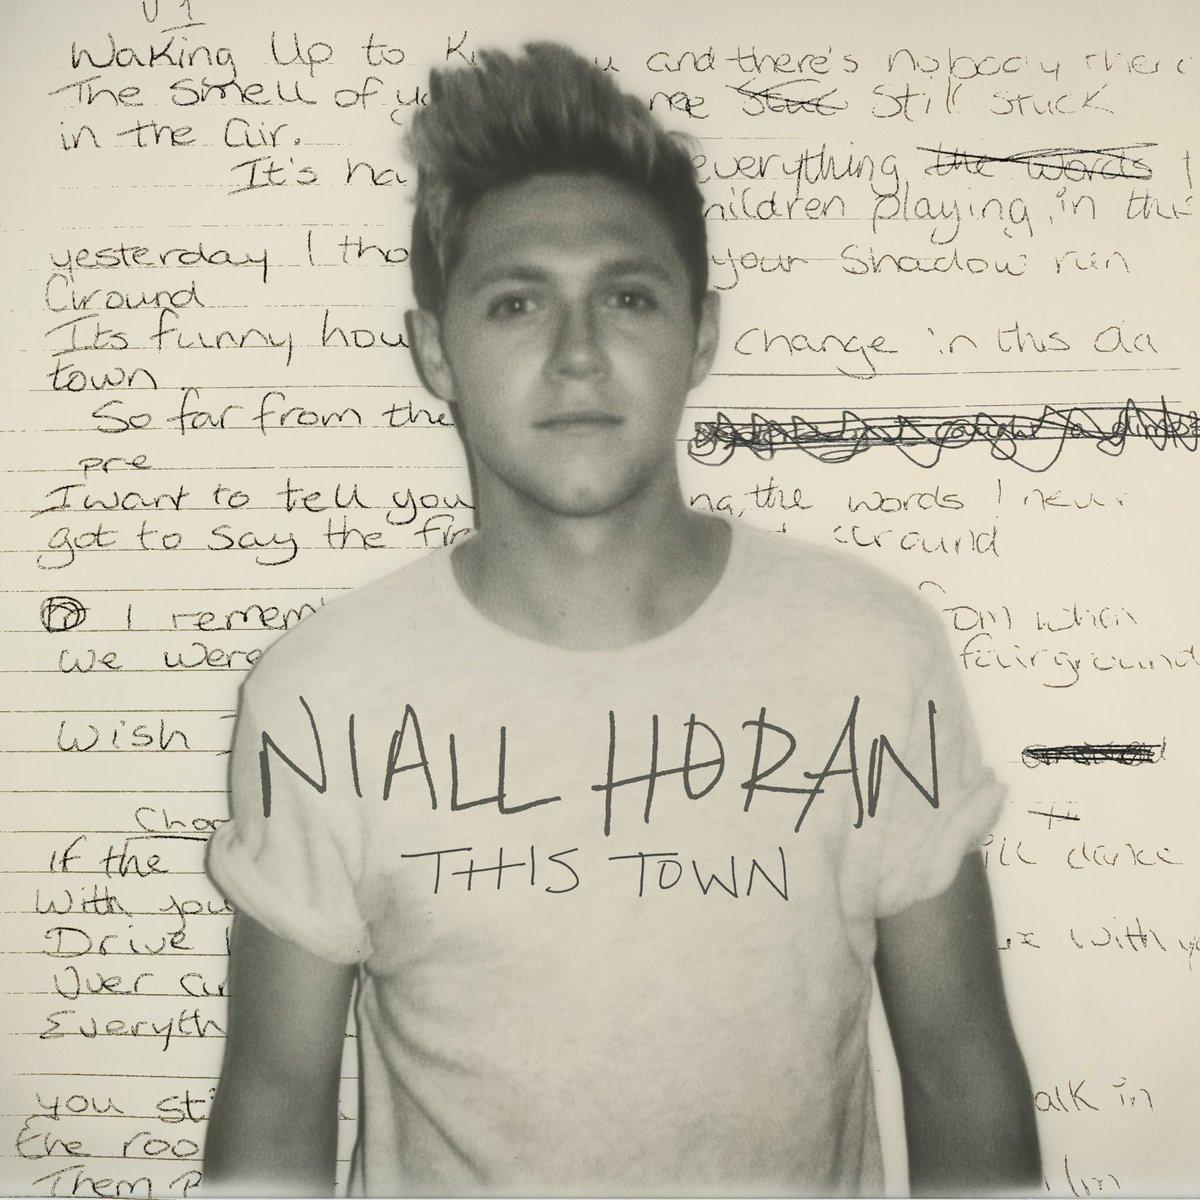 Get @NiallOfficial's debut solo single #ThisTown (& listen all weekend long) here: https://t.co/guOfPZyahS https://t.co/j73nXYqgWv